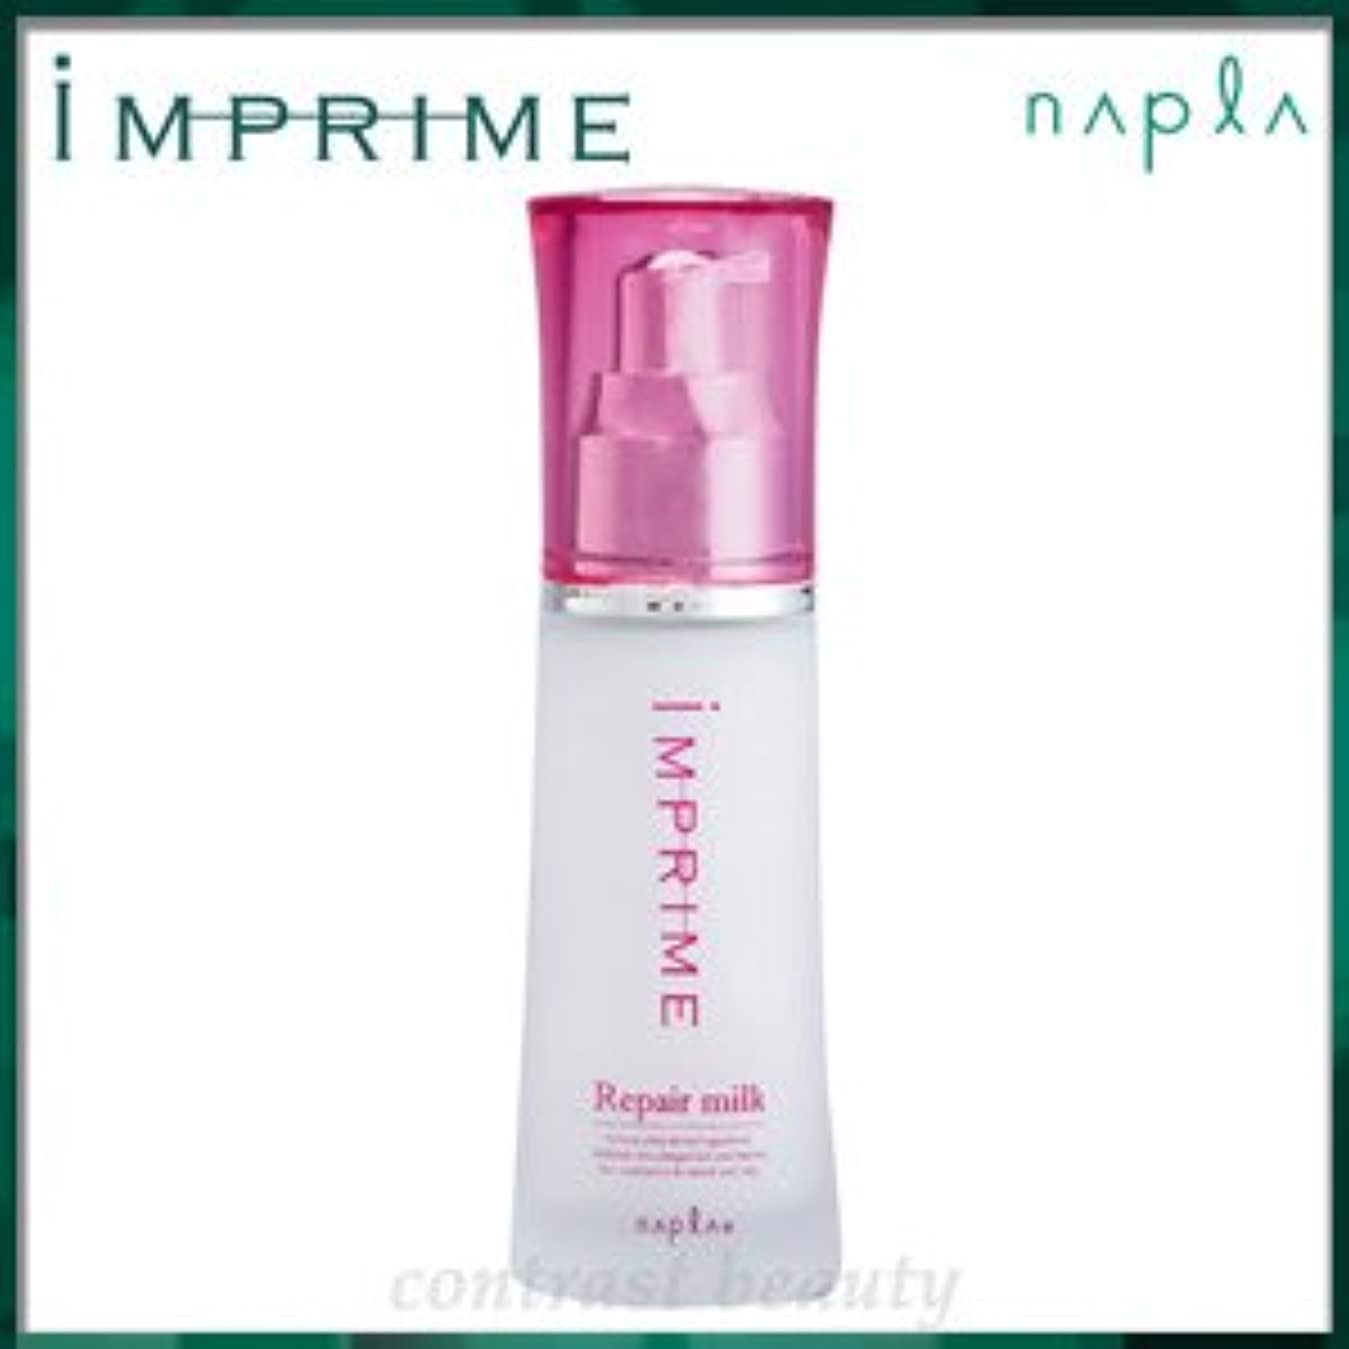 【X5個セット】 ナプラ インプライム リペアミルク 100ml IMPRIME napla